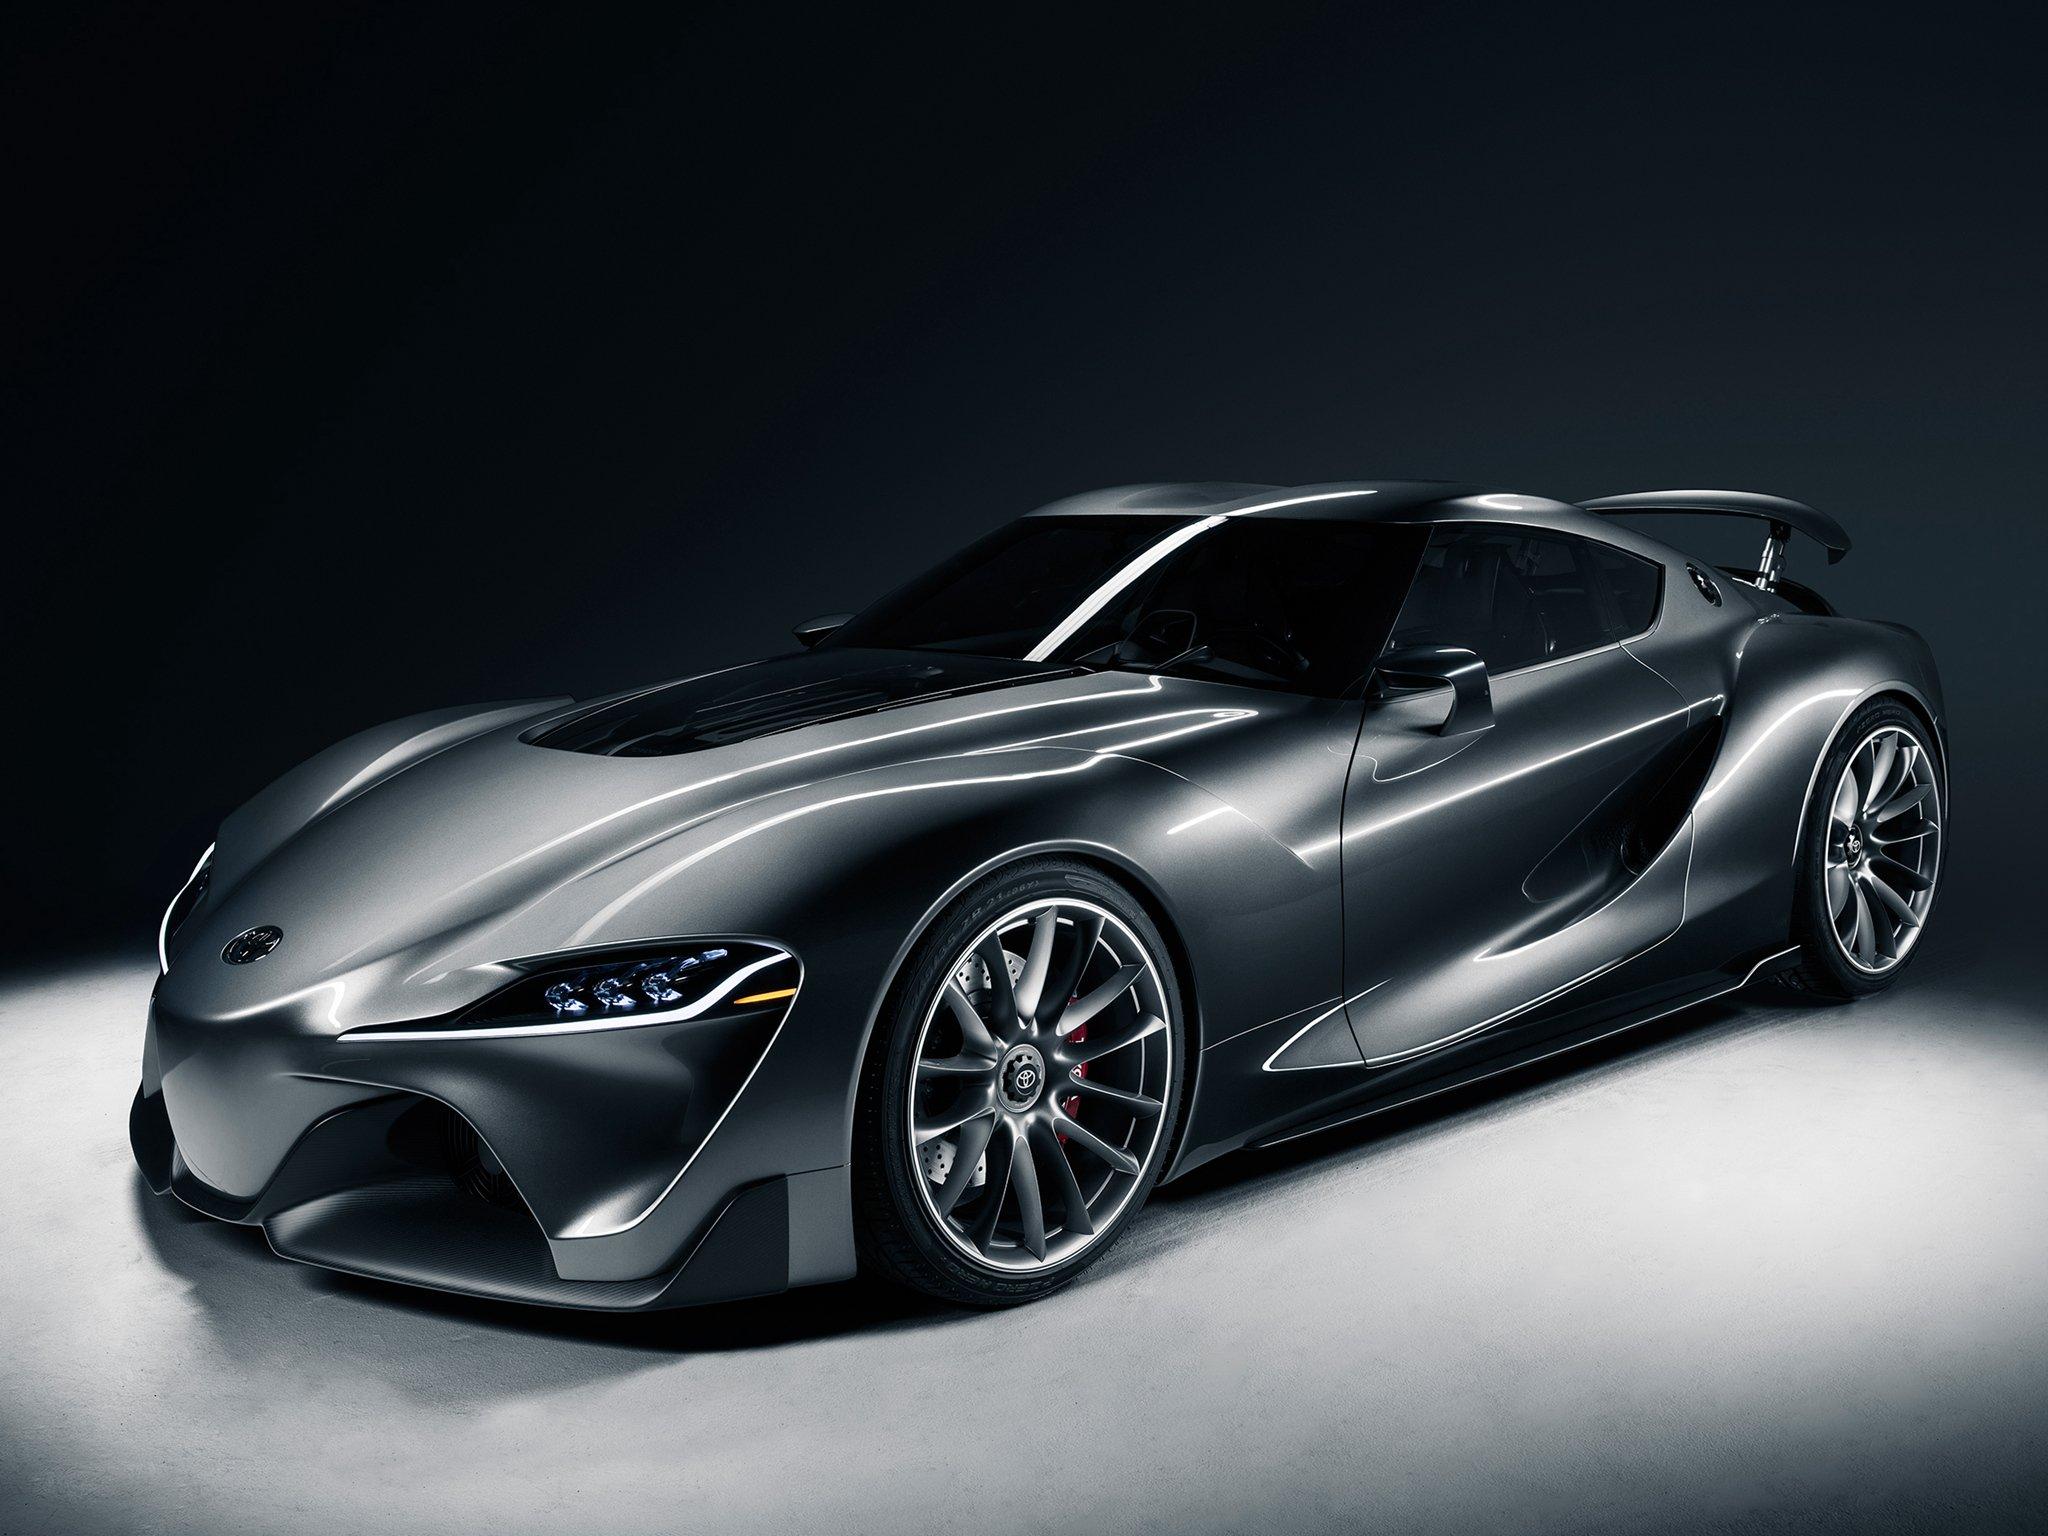 2014 toyota ft1 graphite concept supercar d wallpaper